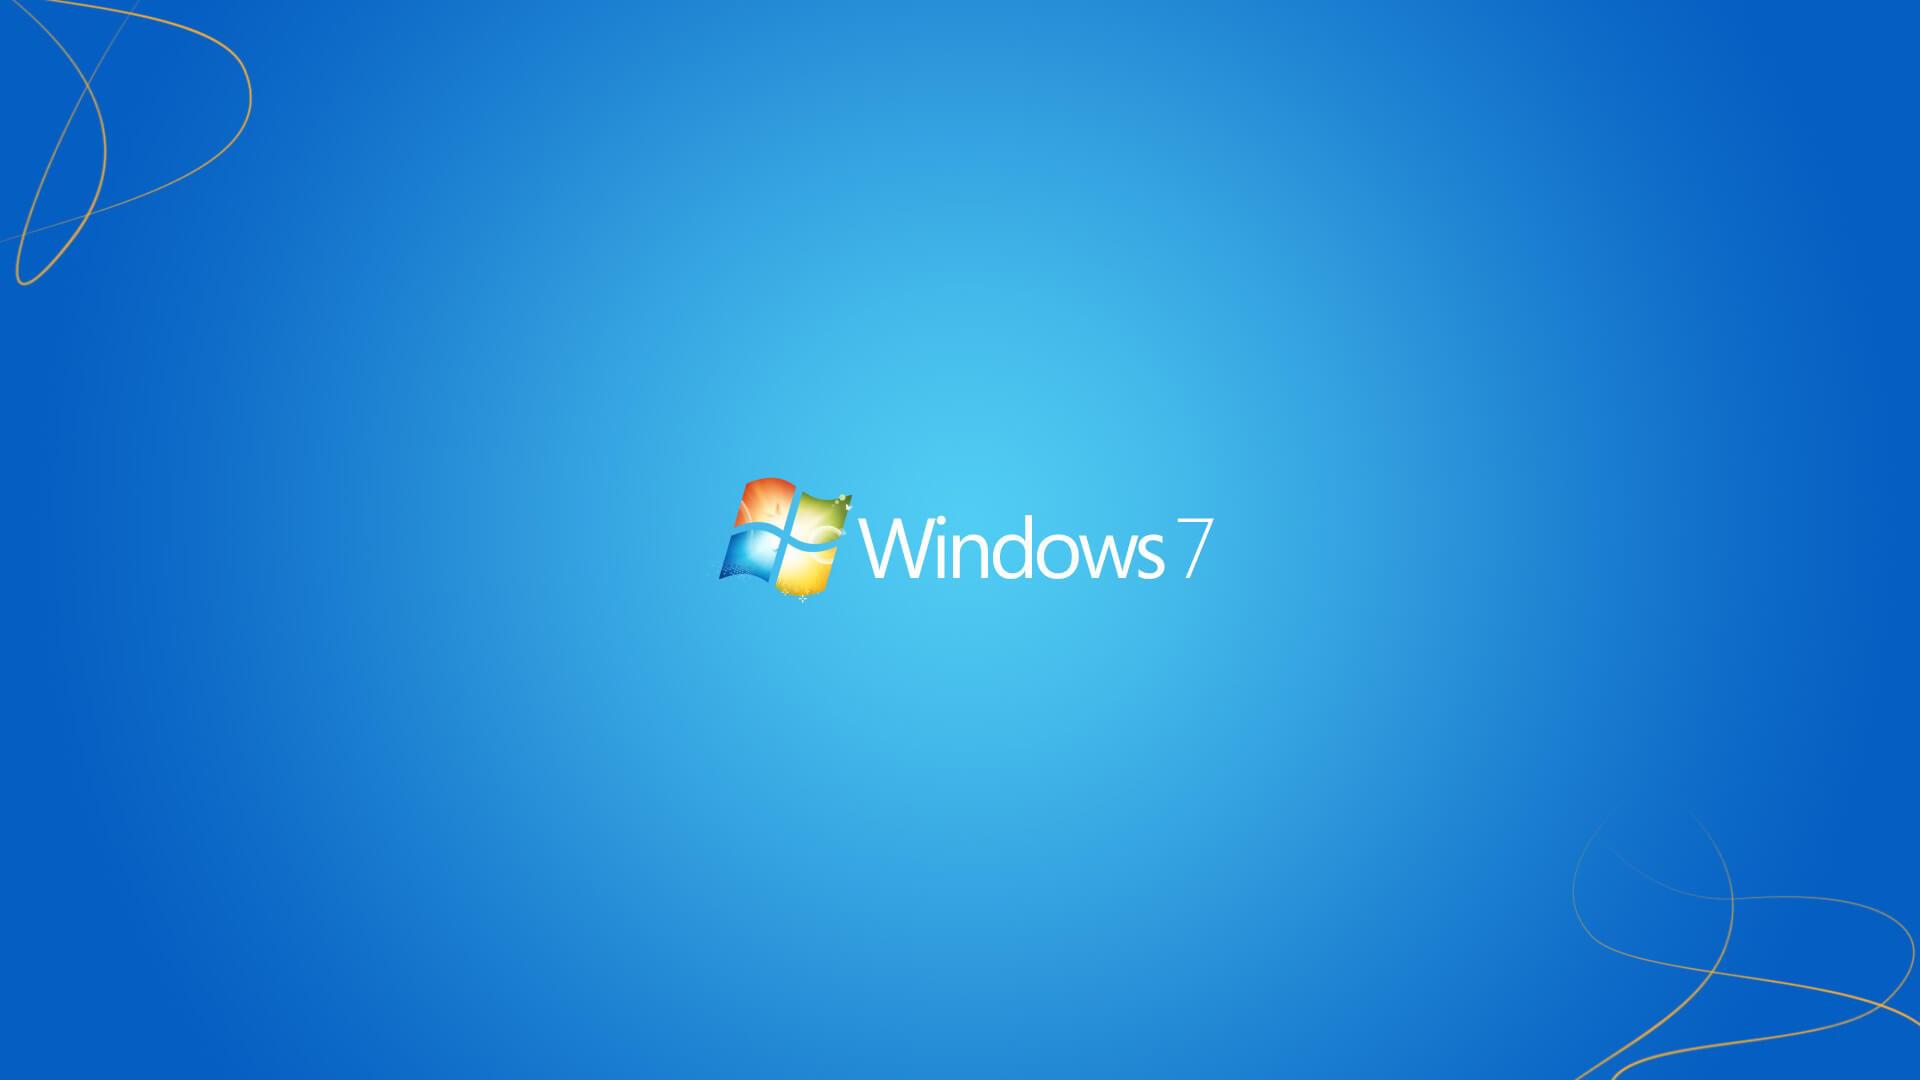 Windows7 ব্যবহারকারীদের জন্য দুঃসংবাদ! বন্ধ হয়ে যাচ্ছে Windows7